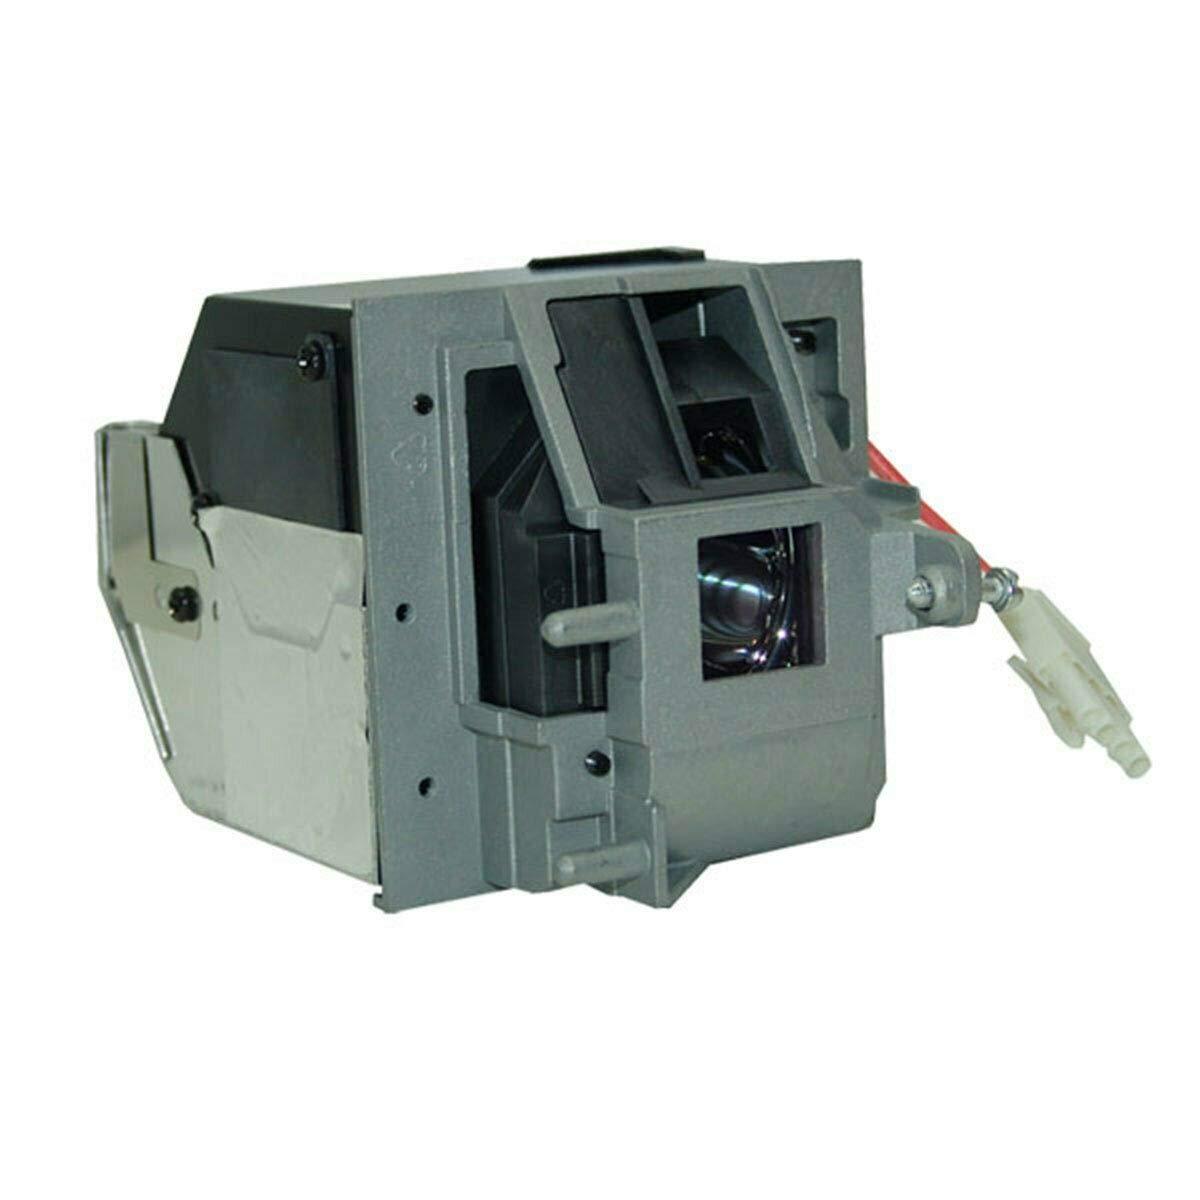 CTLAMP SP-LAMP-024 オリジナルプロジェクターランプ SP-LAMP-024 ハウジング付き電球 INFOCUS IN24 / IN26 / IN24EP / W240 / W260に対応 B07PSJ6W4H